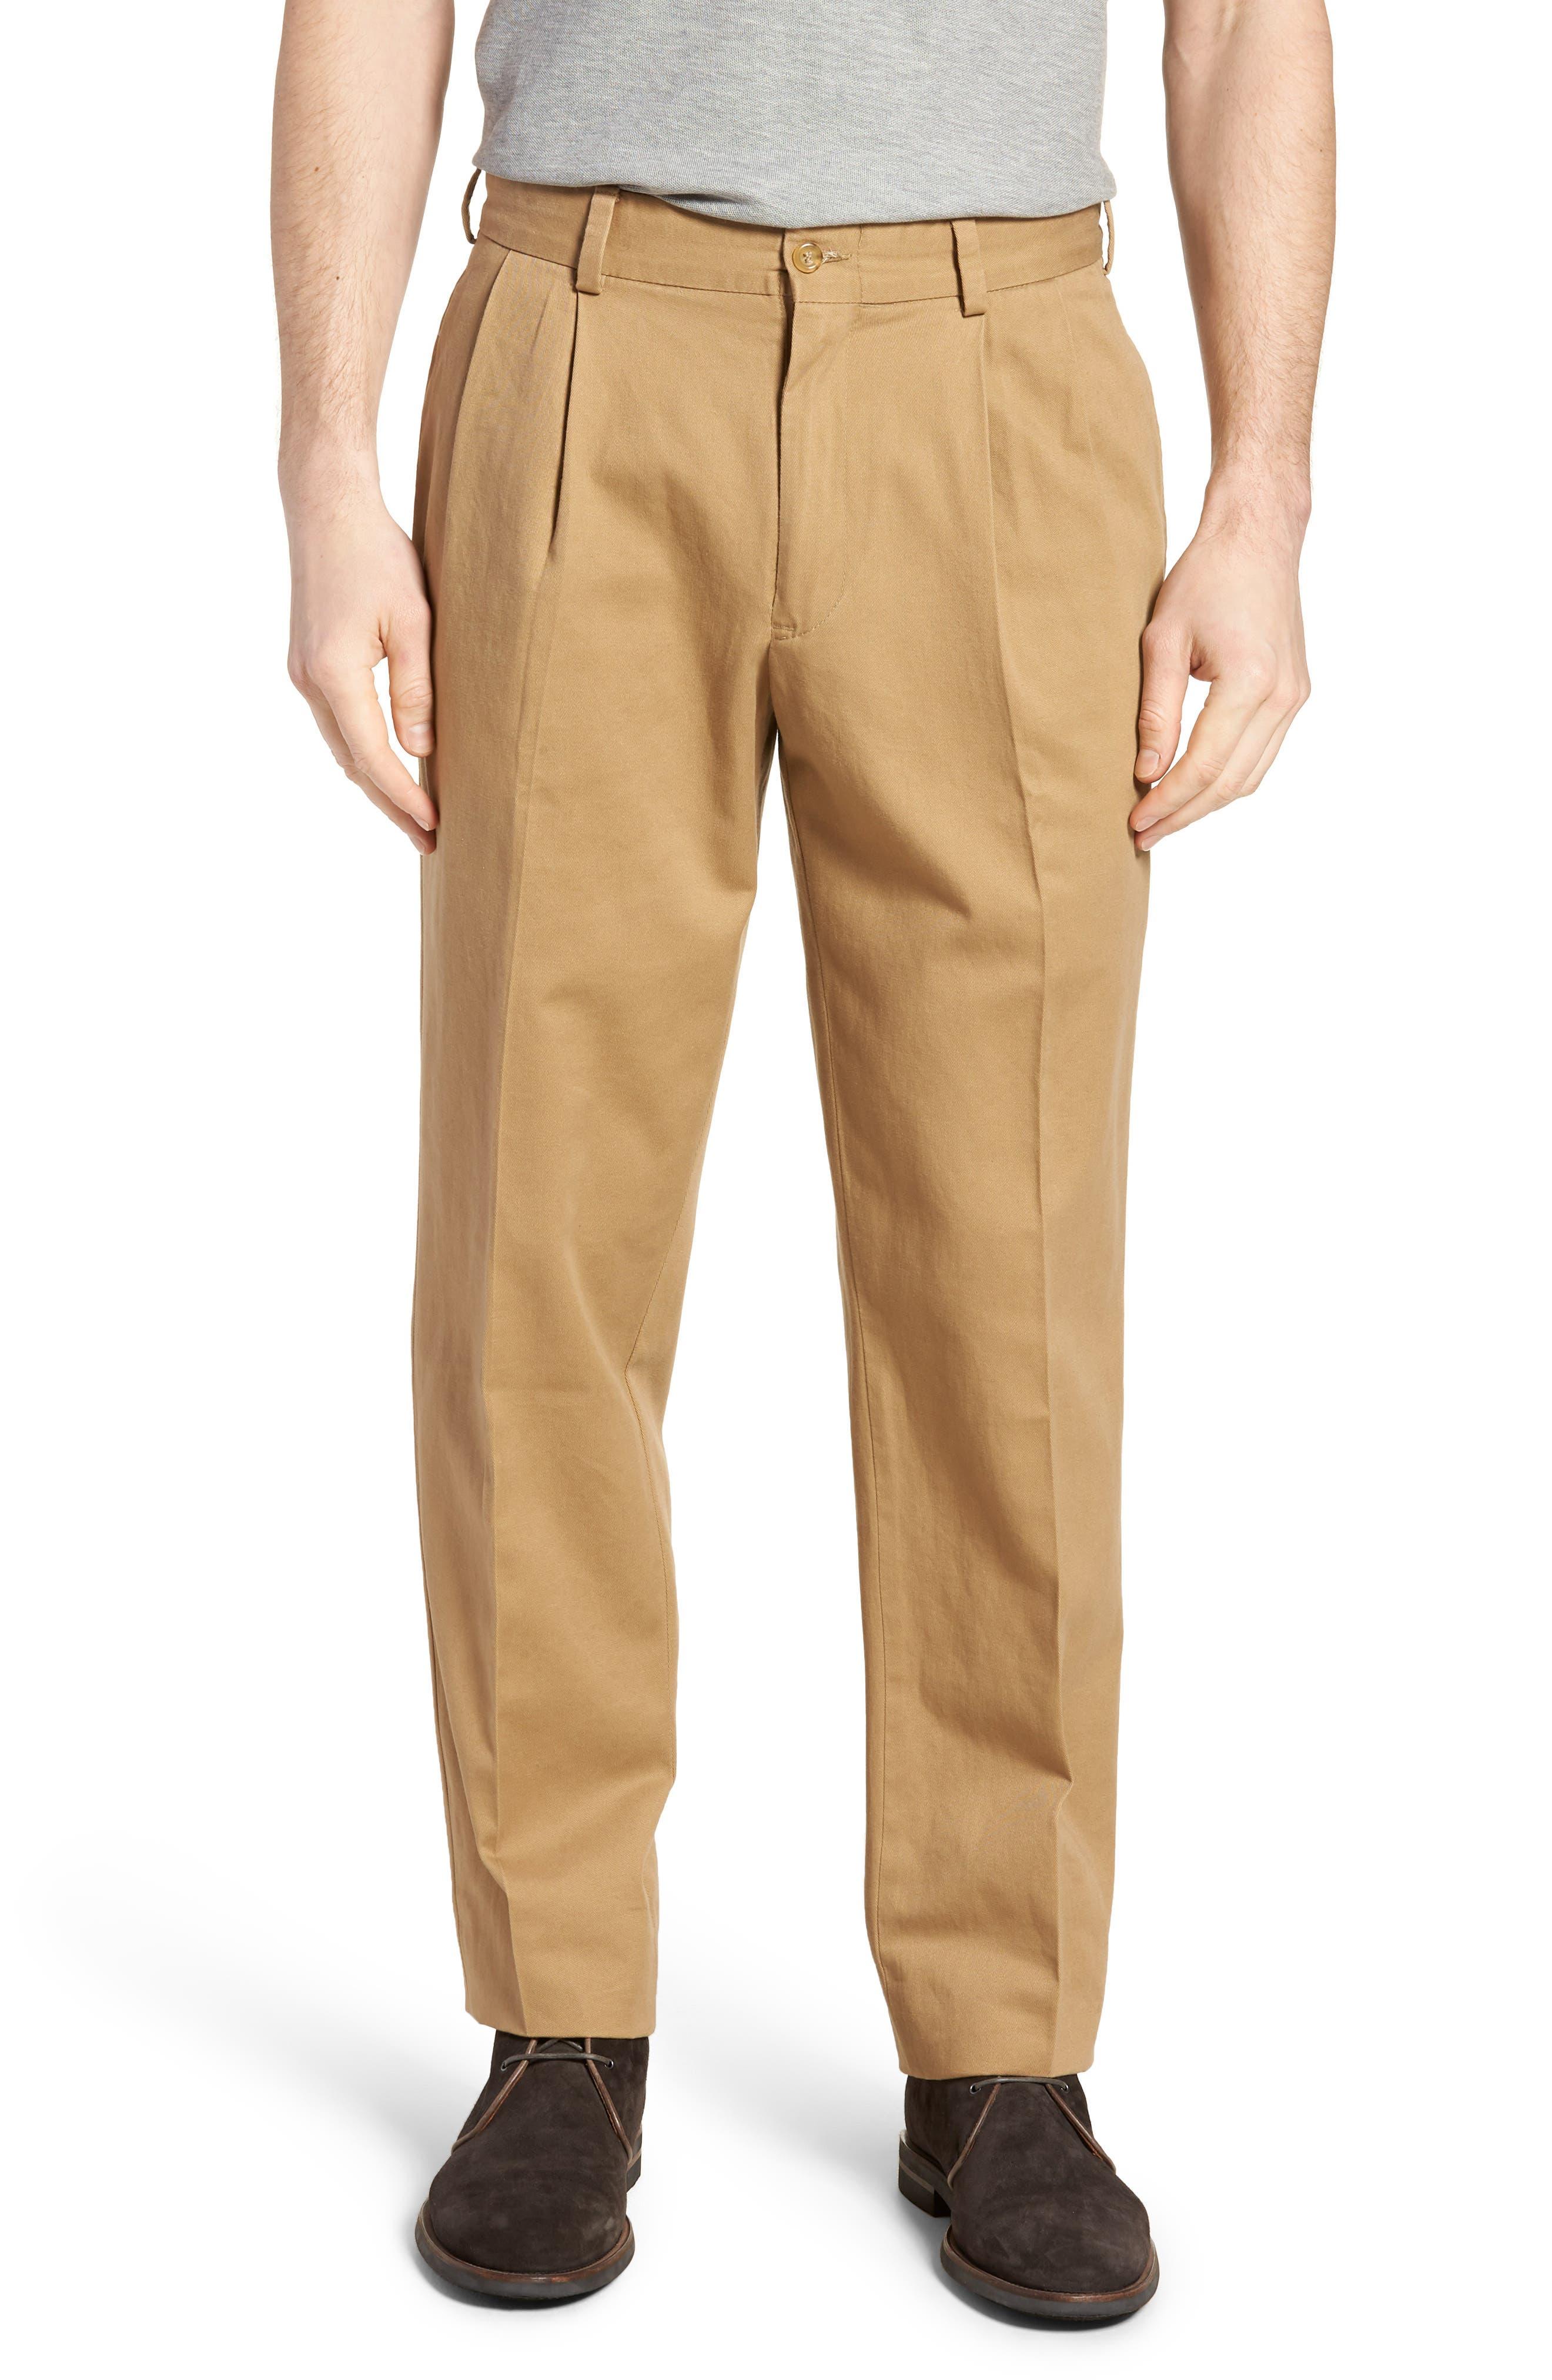 M2 Classic Fit Pleated Vintage Twill Pants,                         Main,                         color, BRITISH KHAKI